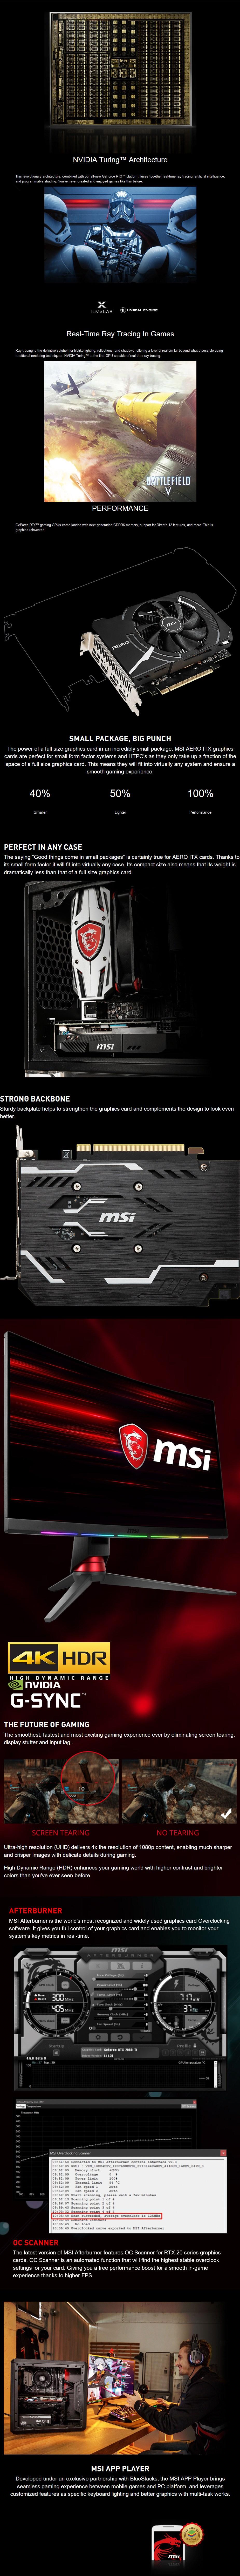 MSI GeForce RTX 2060 AERO ITX 6GB OC Video Card - Desktop Overview 1